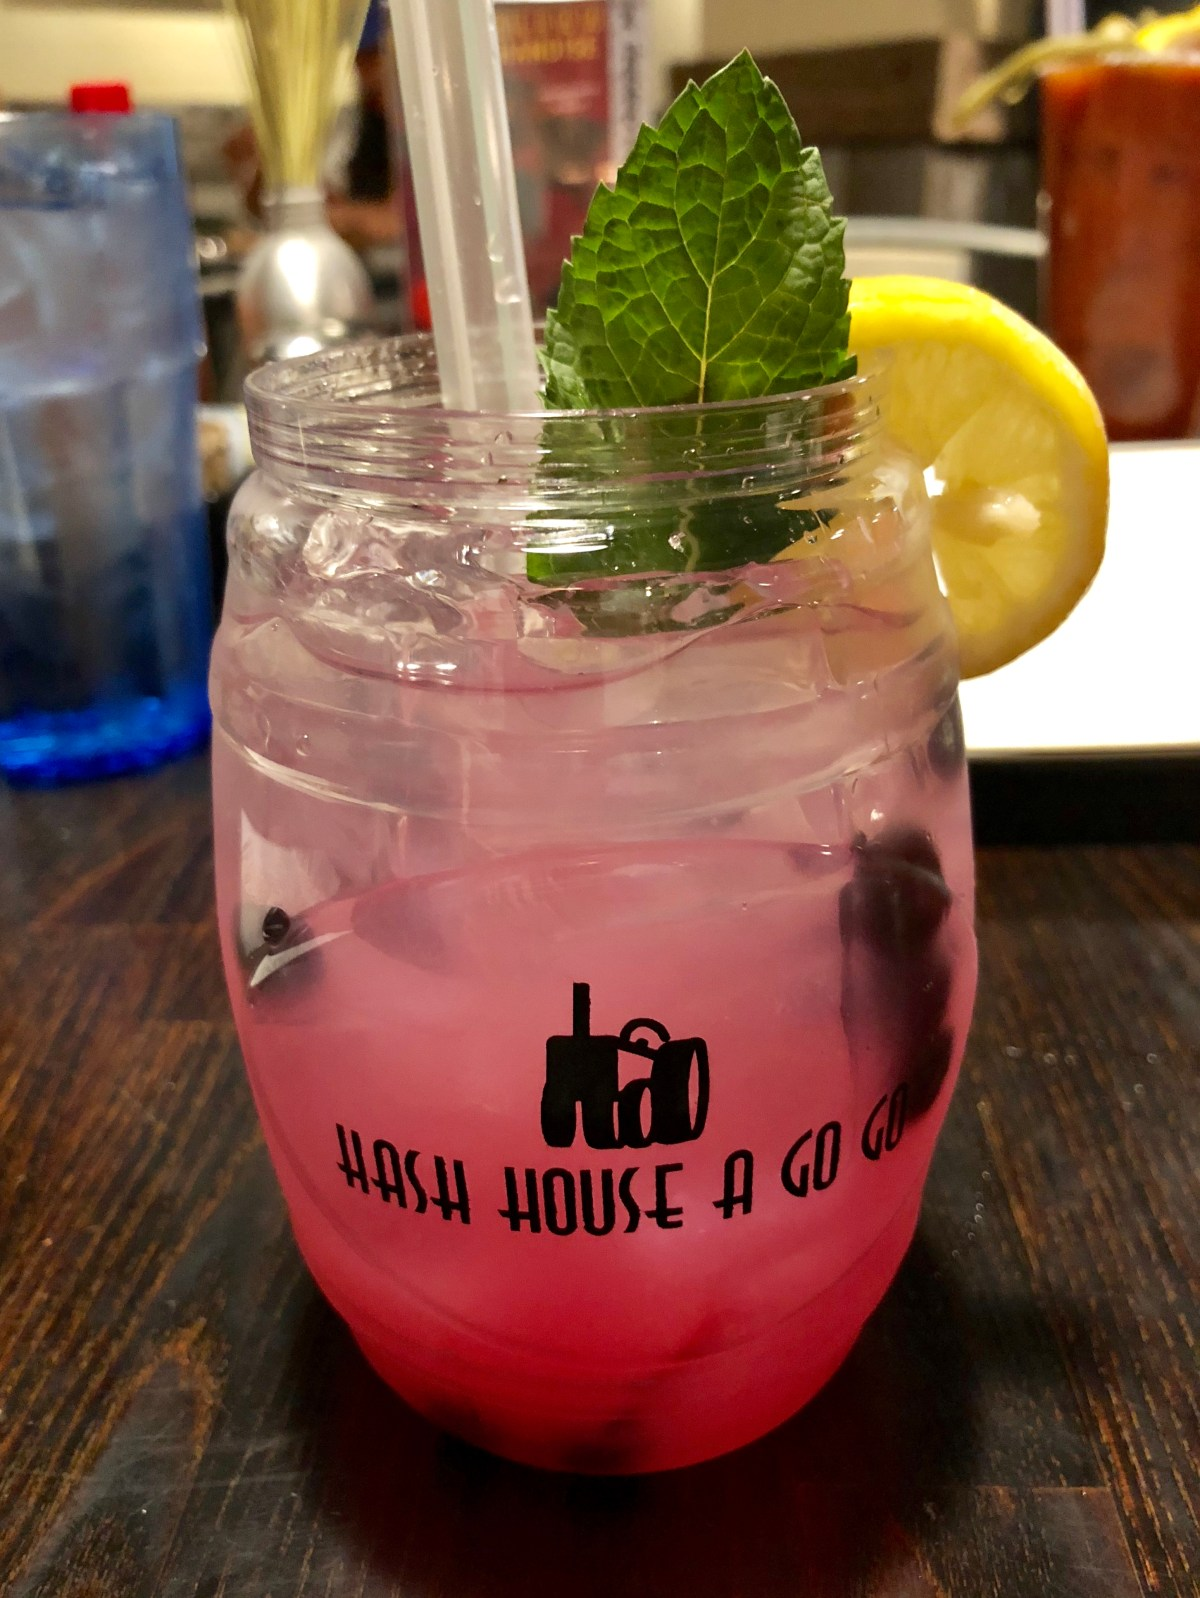 Hash House A Go Go #huckleberrysin #hashhouseagogo #thelinq #wheretoeatinvegas #lasvegas